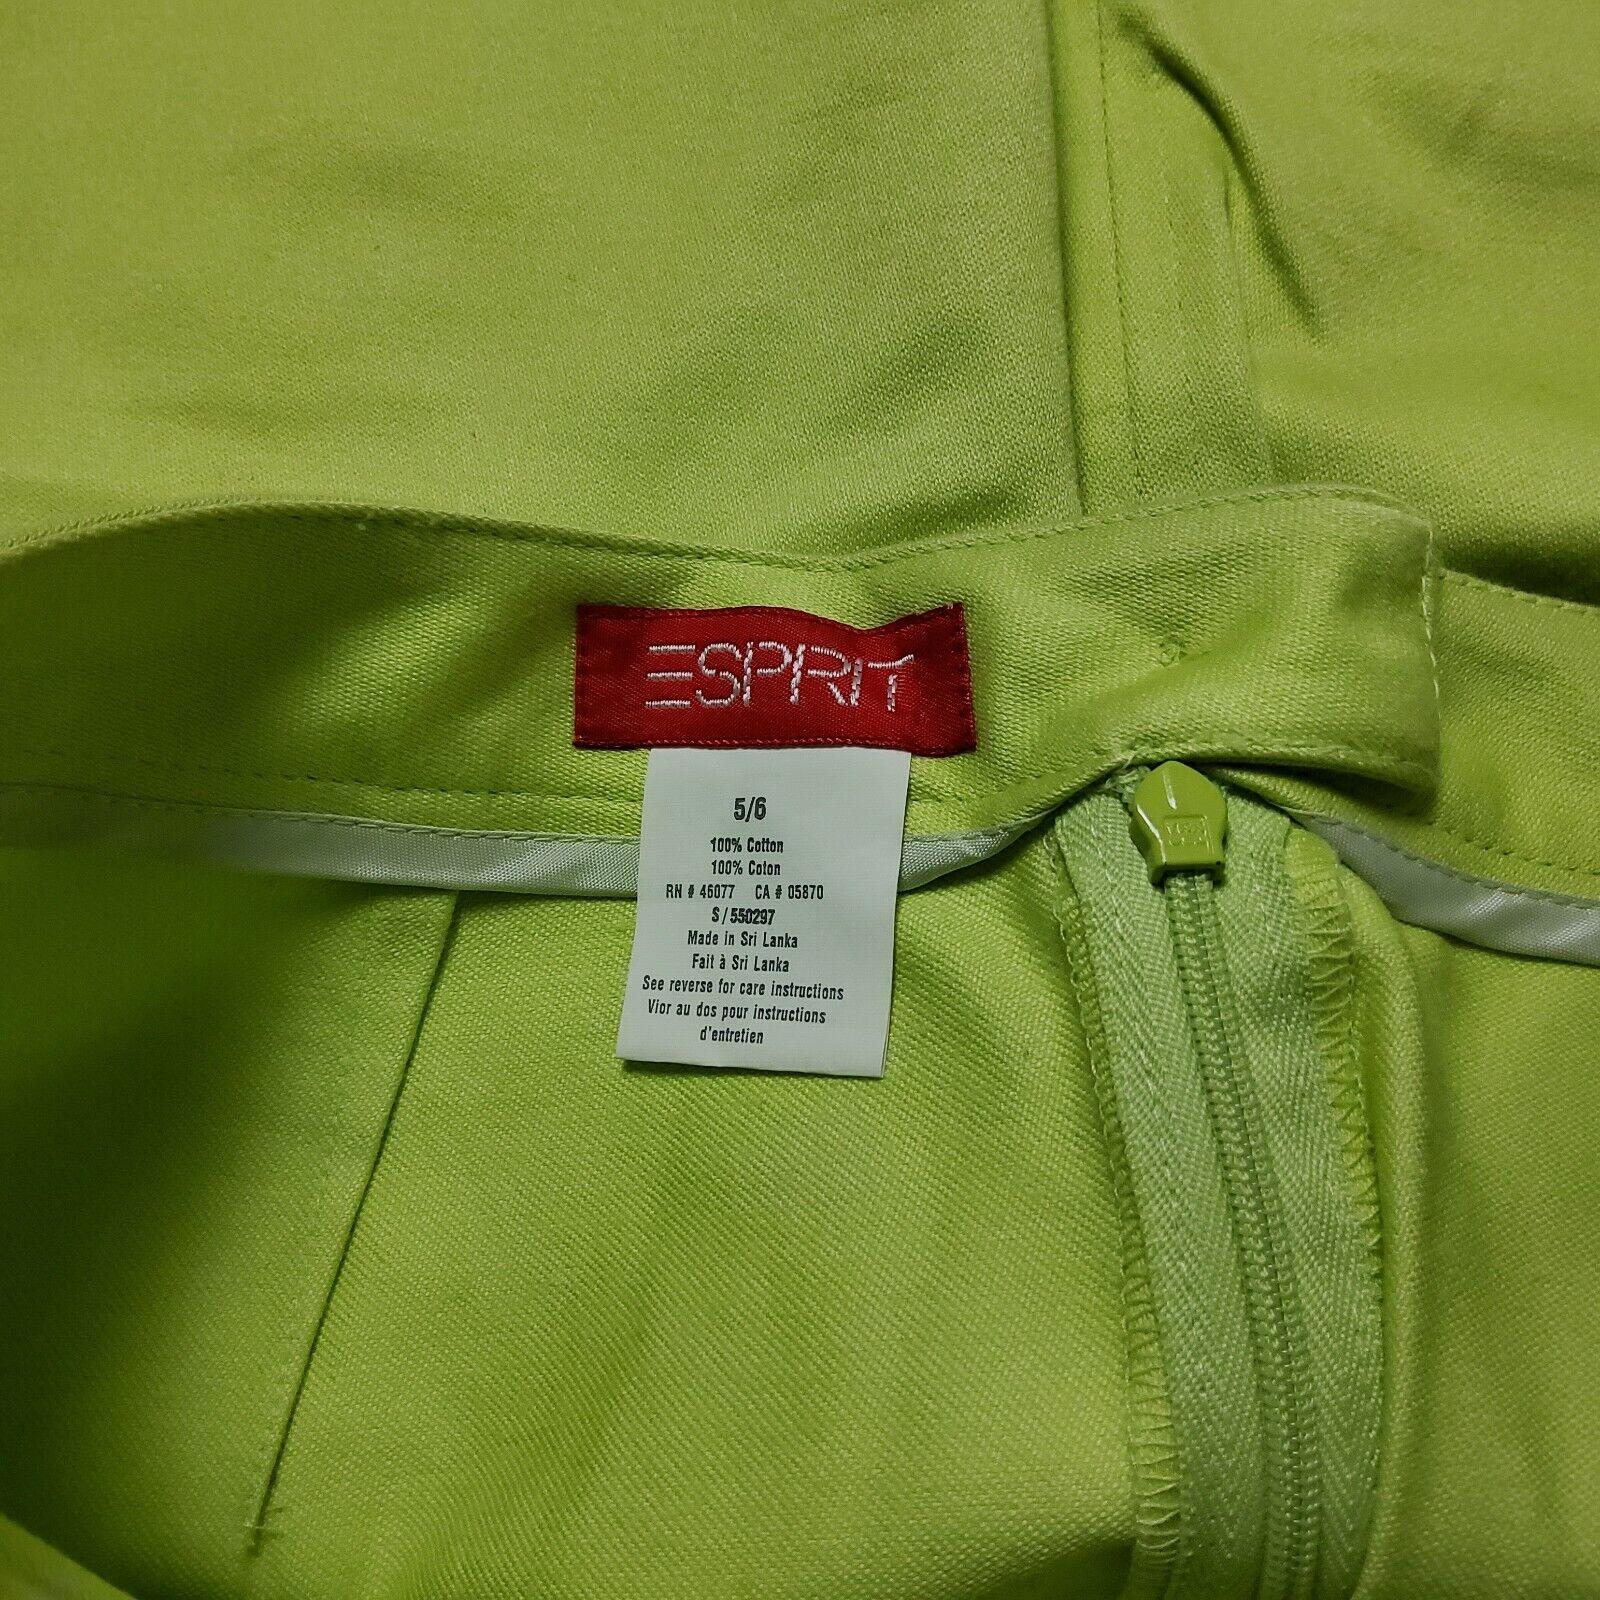 Esprit Neon Green Skirt - image 4